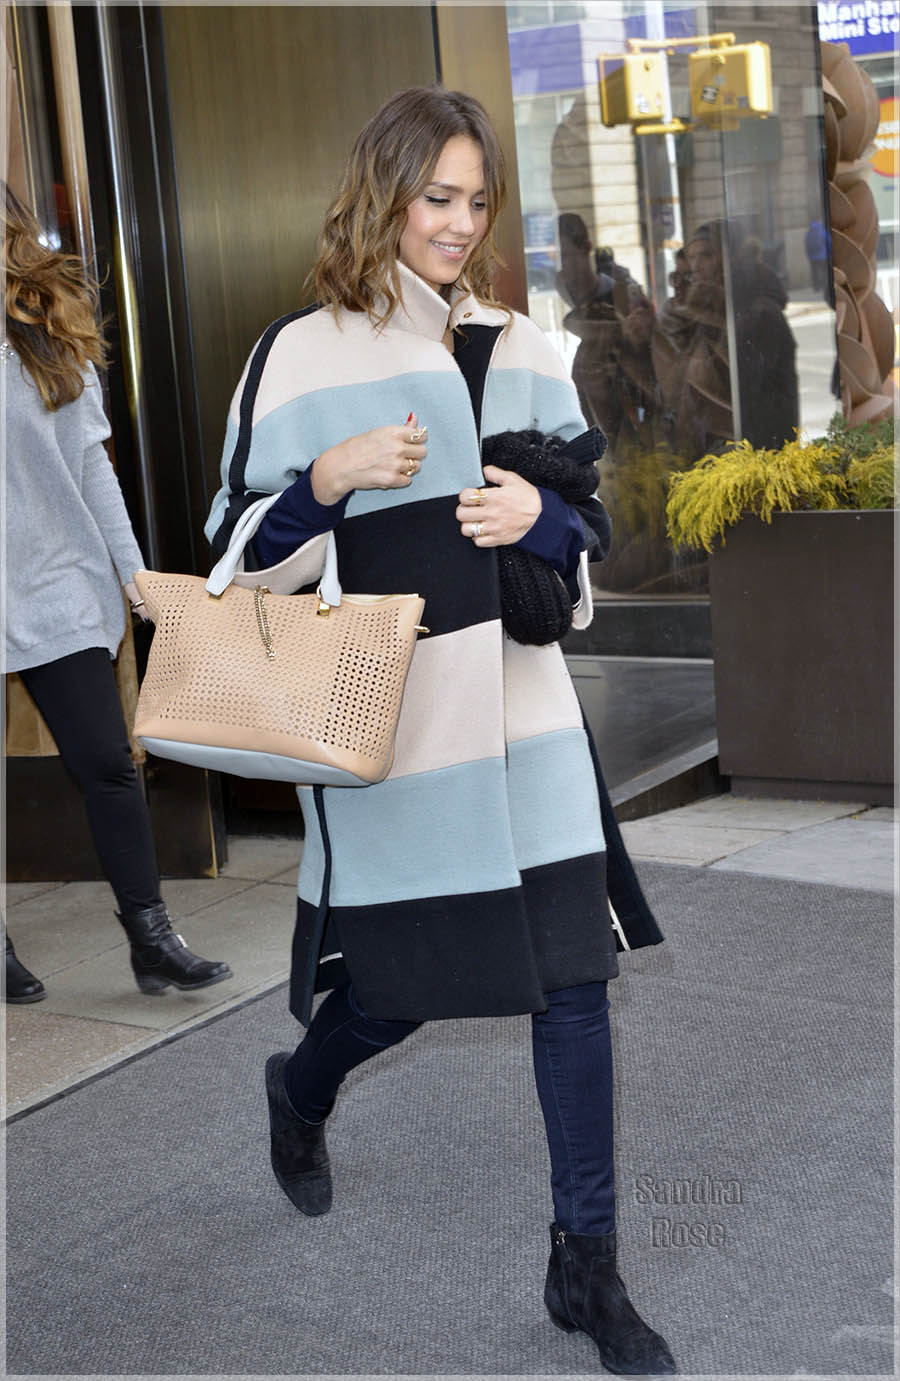 Jessica Alba leaving her hotel